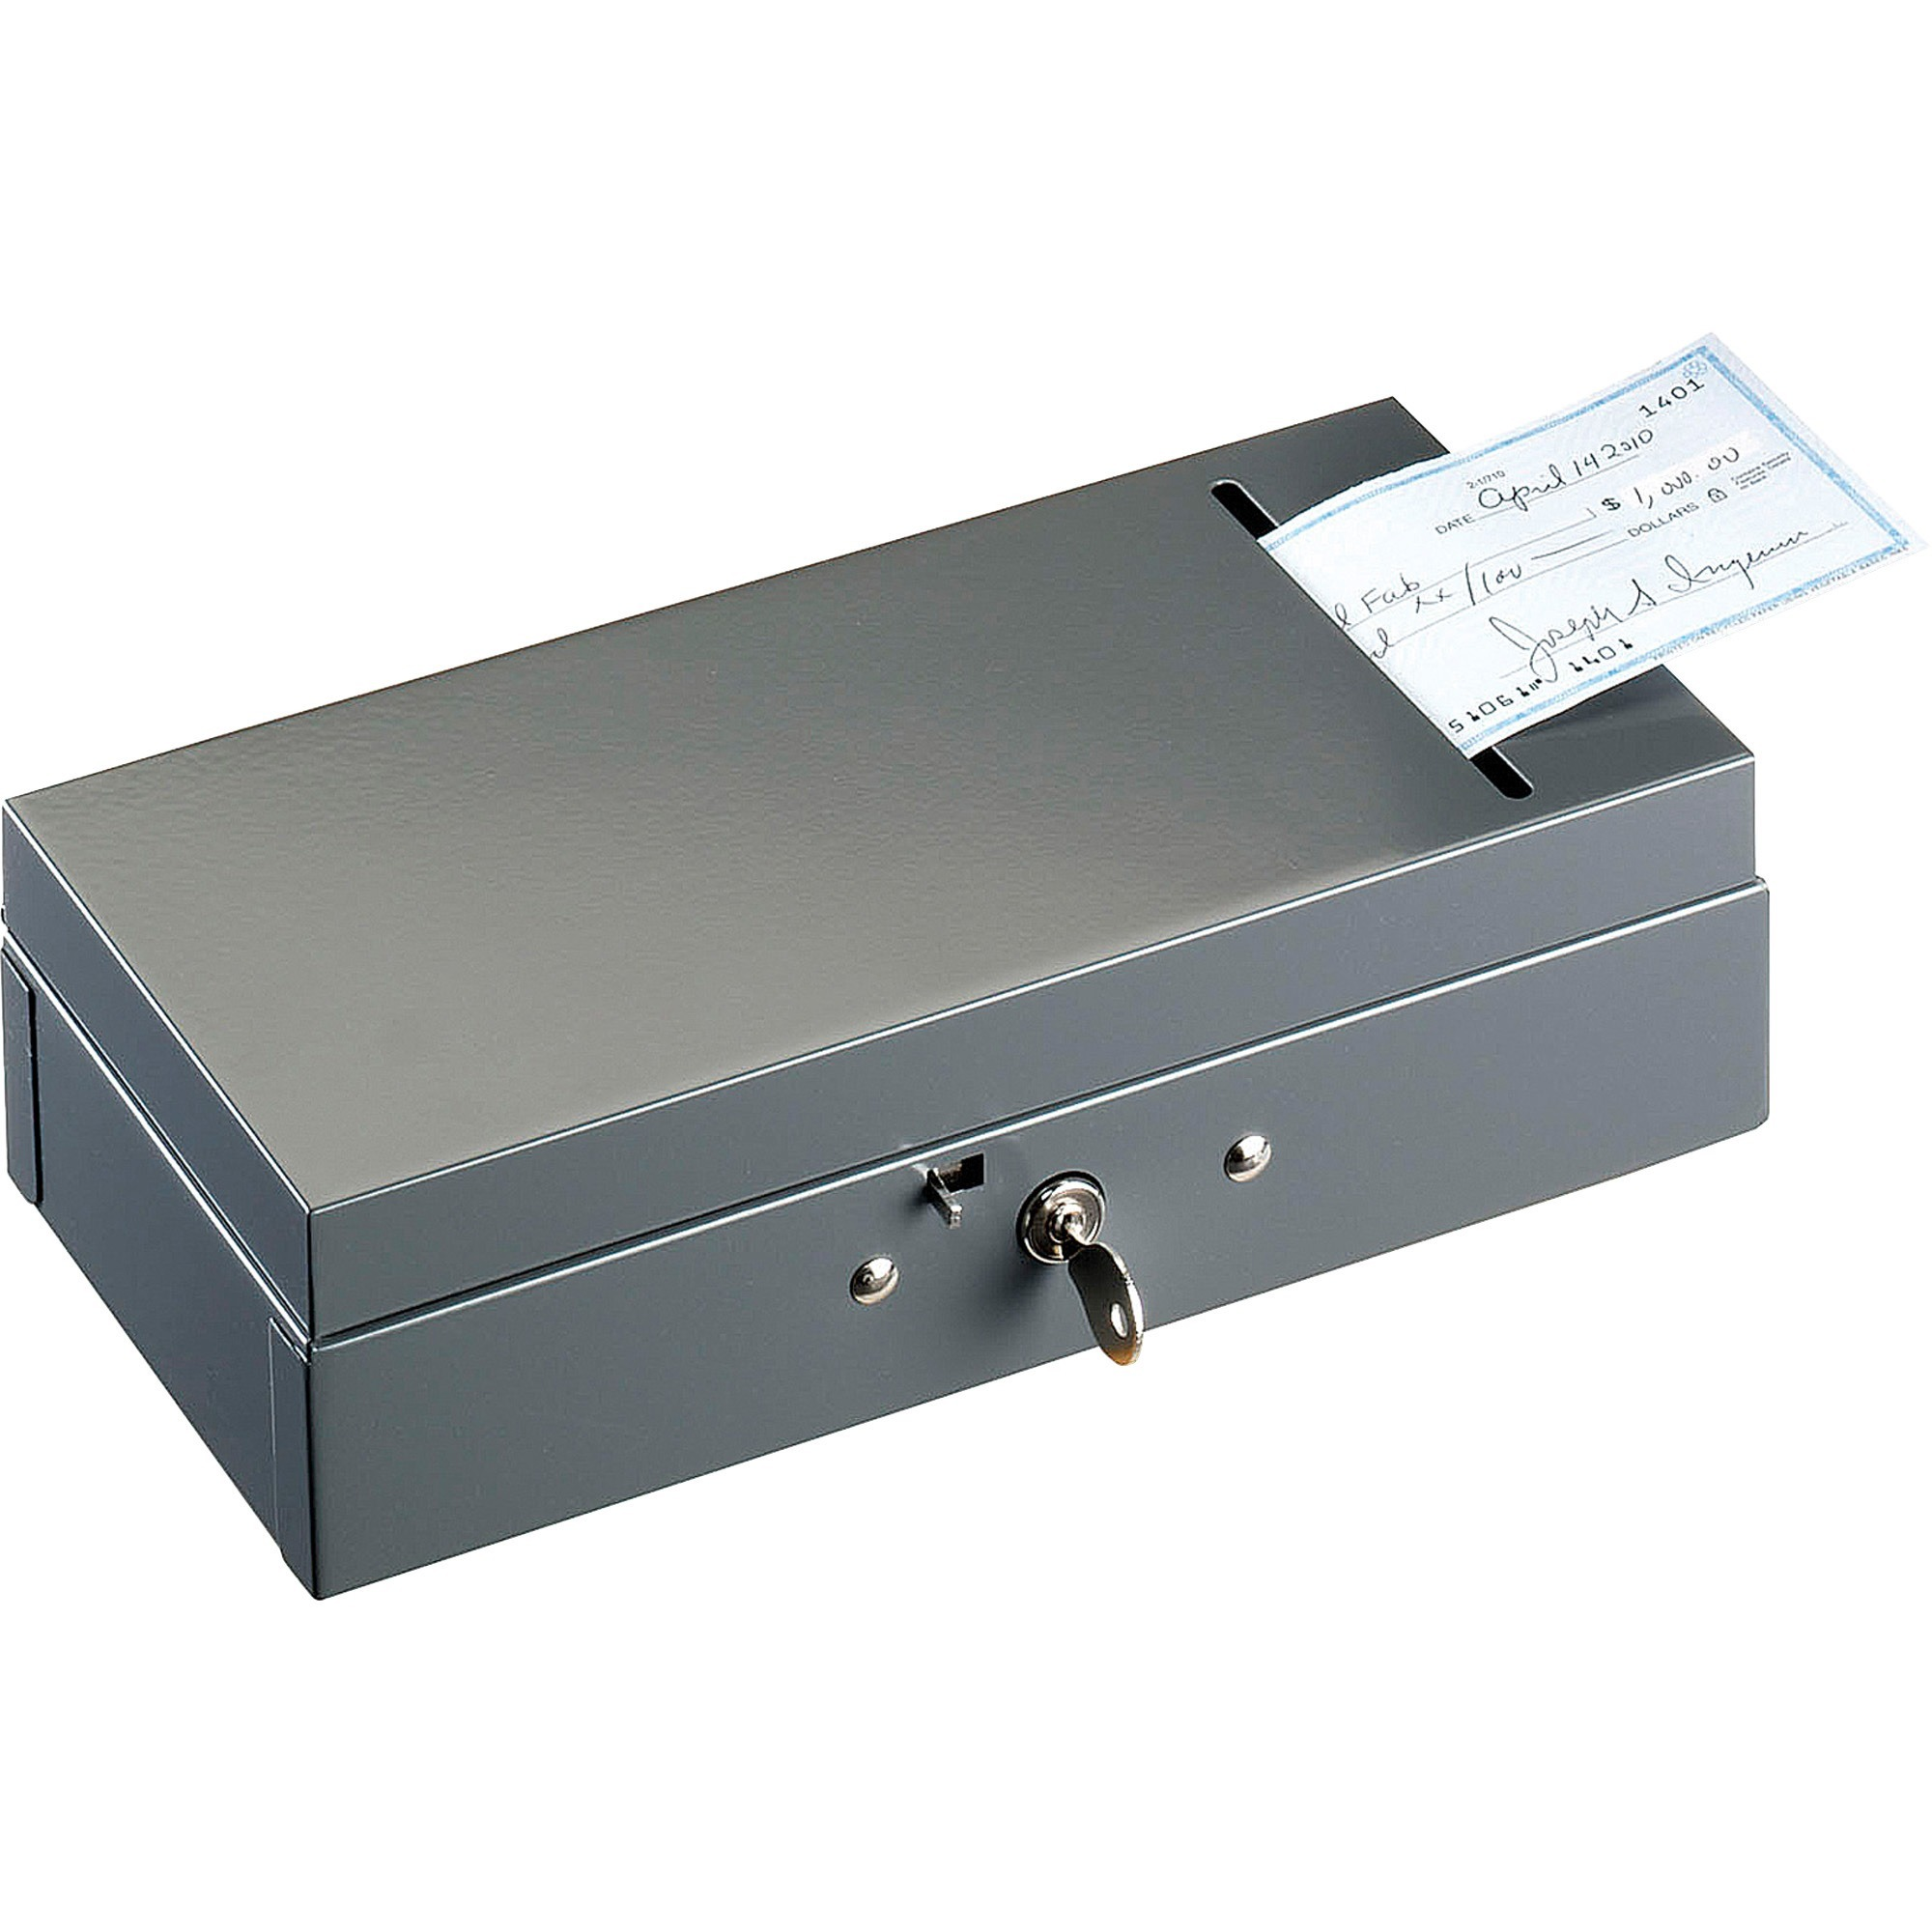 MMF, MMF221104201, ChequeSlot SteelMaster Bond Box, Charcoal Gray